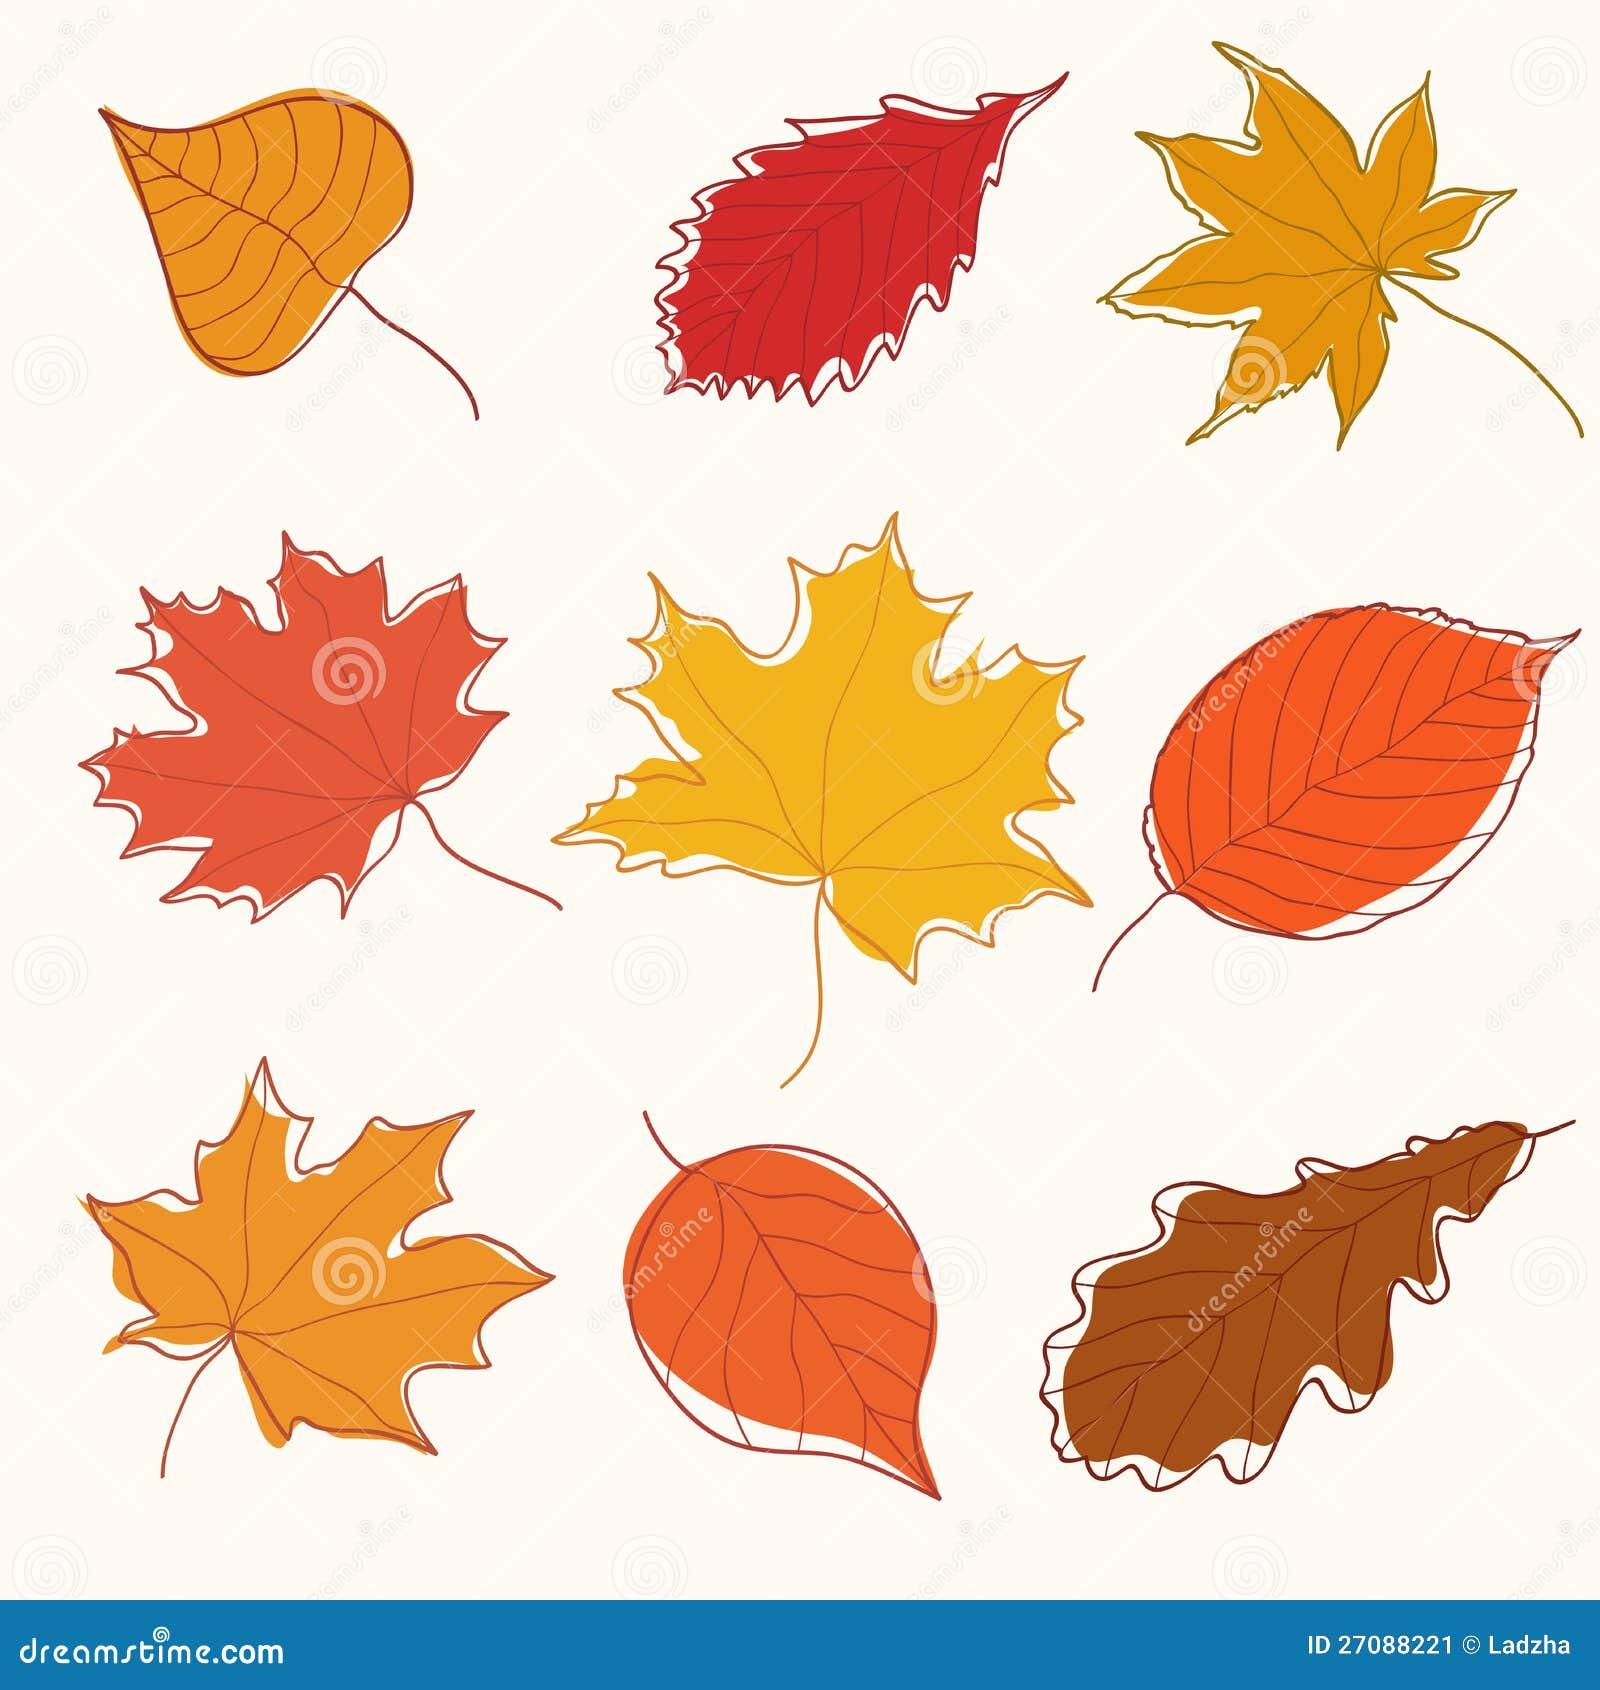 Set Of Autumn Doodle Leaves Stock Vector Illustration Of Botany Element 27088221